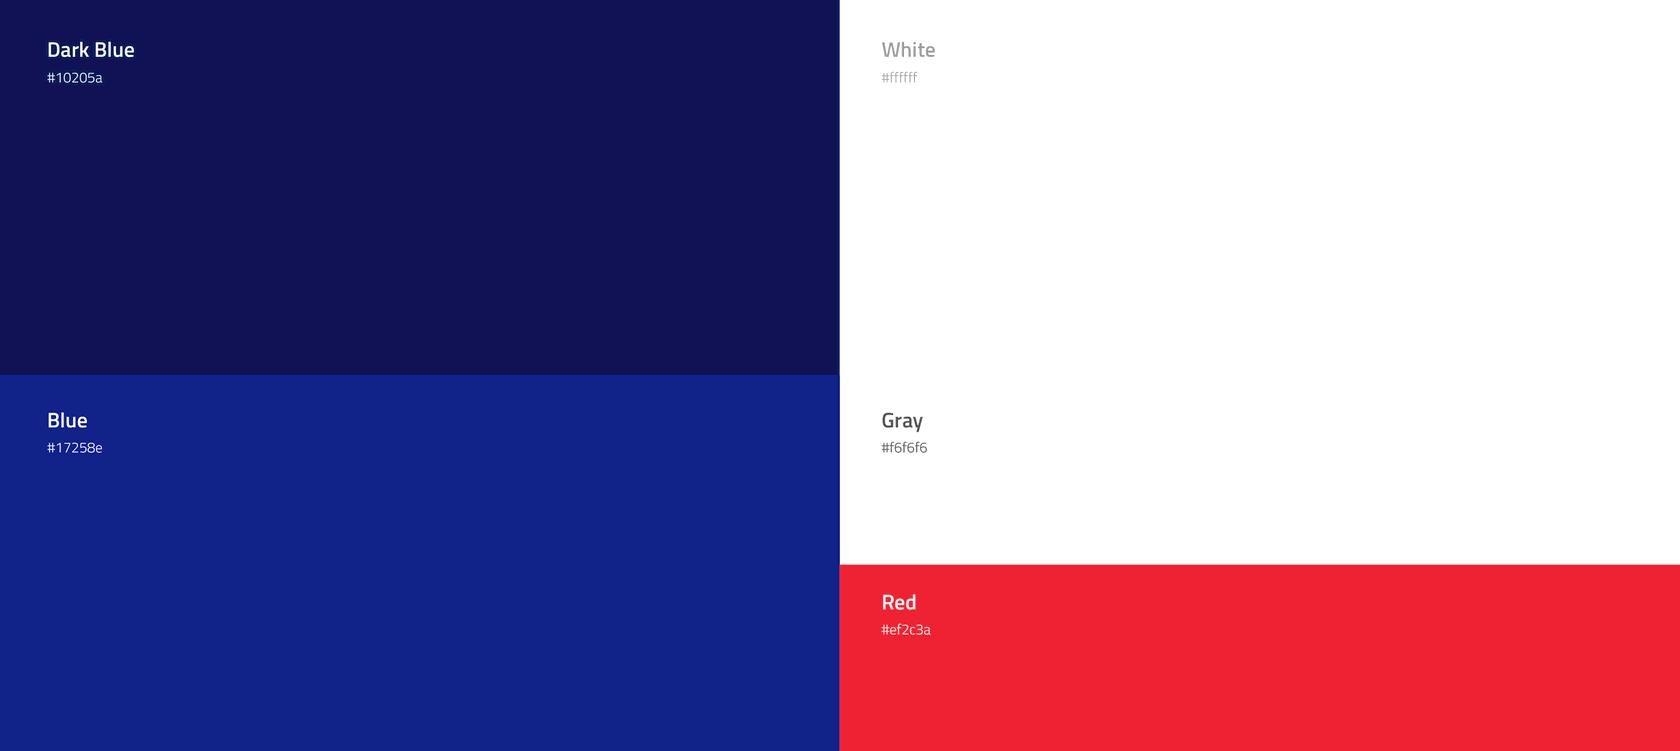 Fintech brand colors